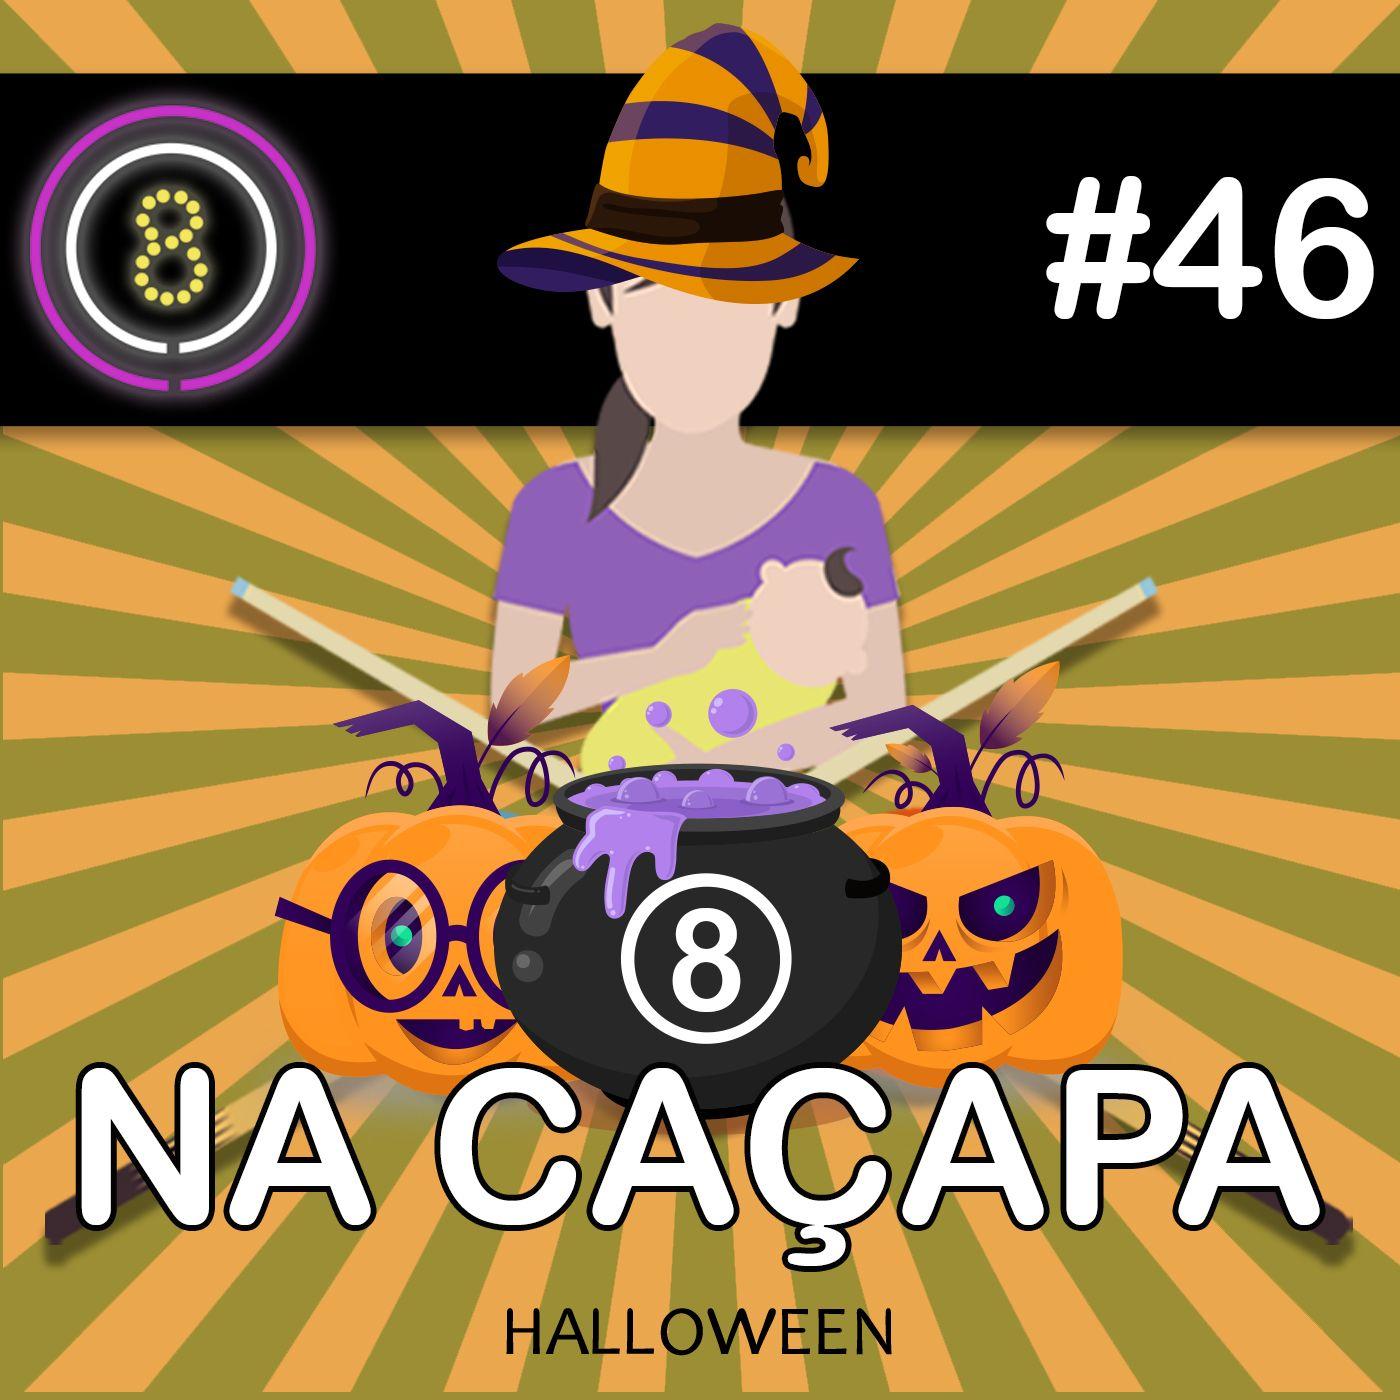 #46 - Halloween (Na Caçapa 07)